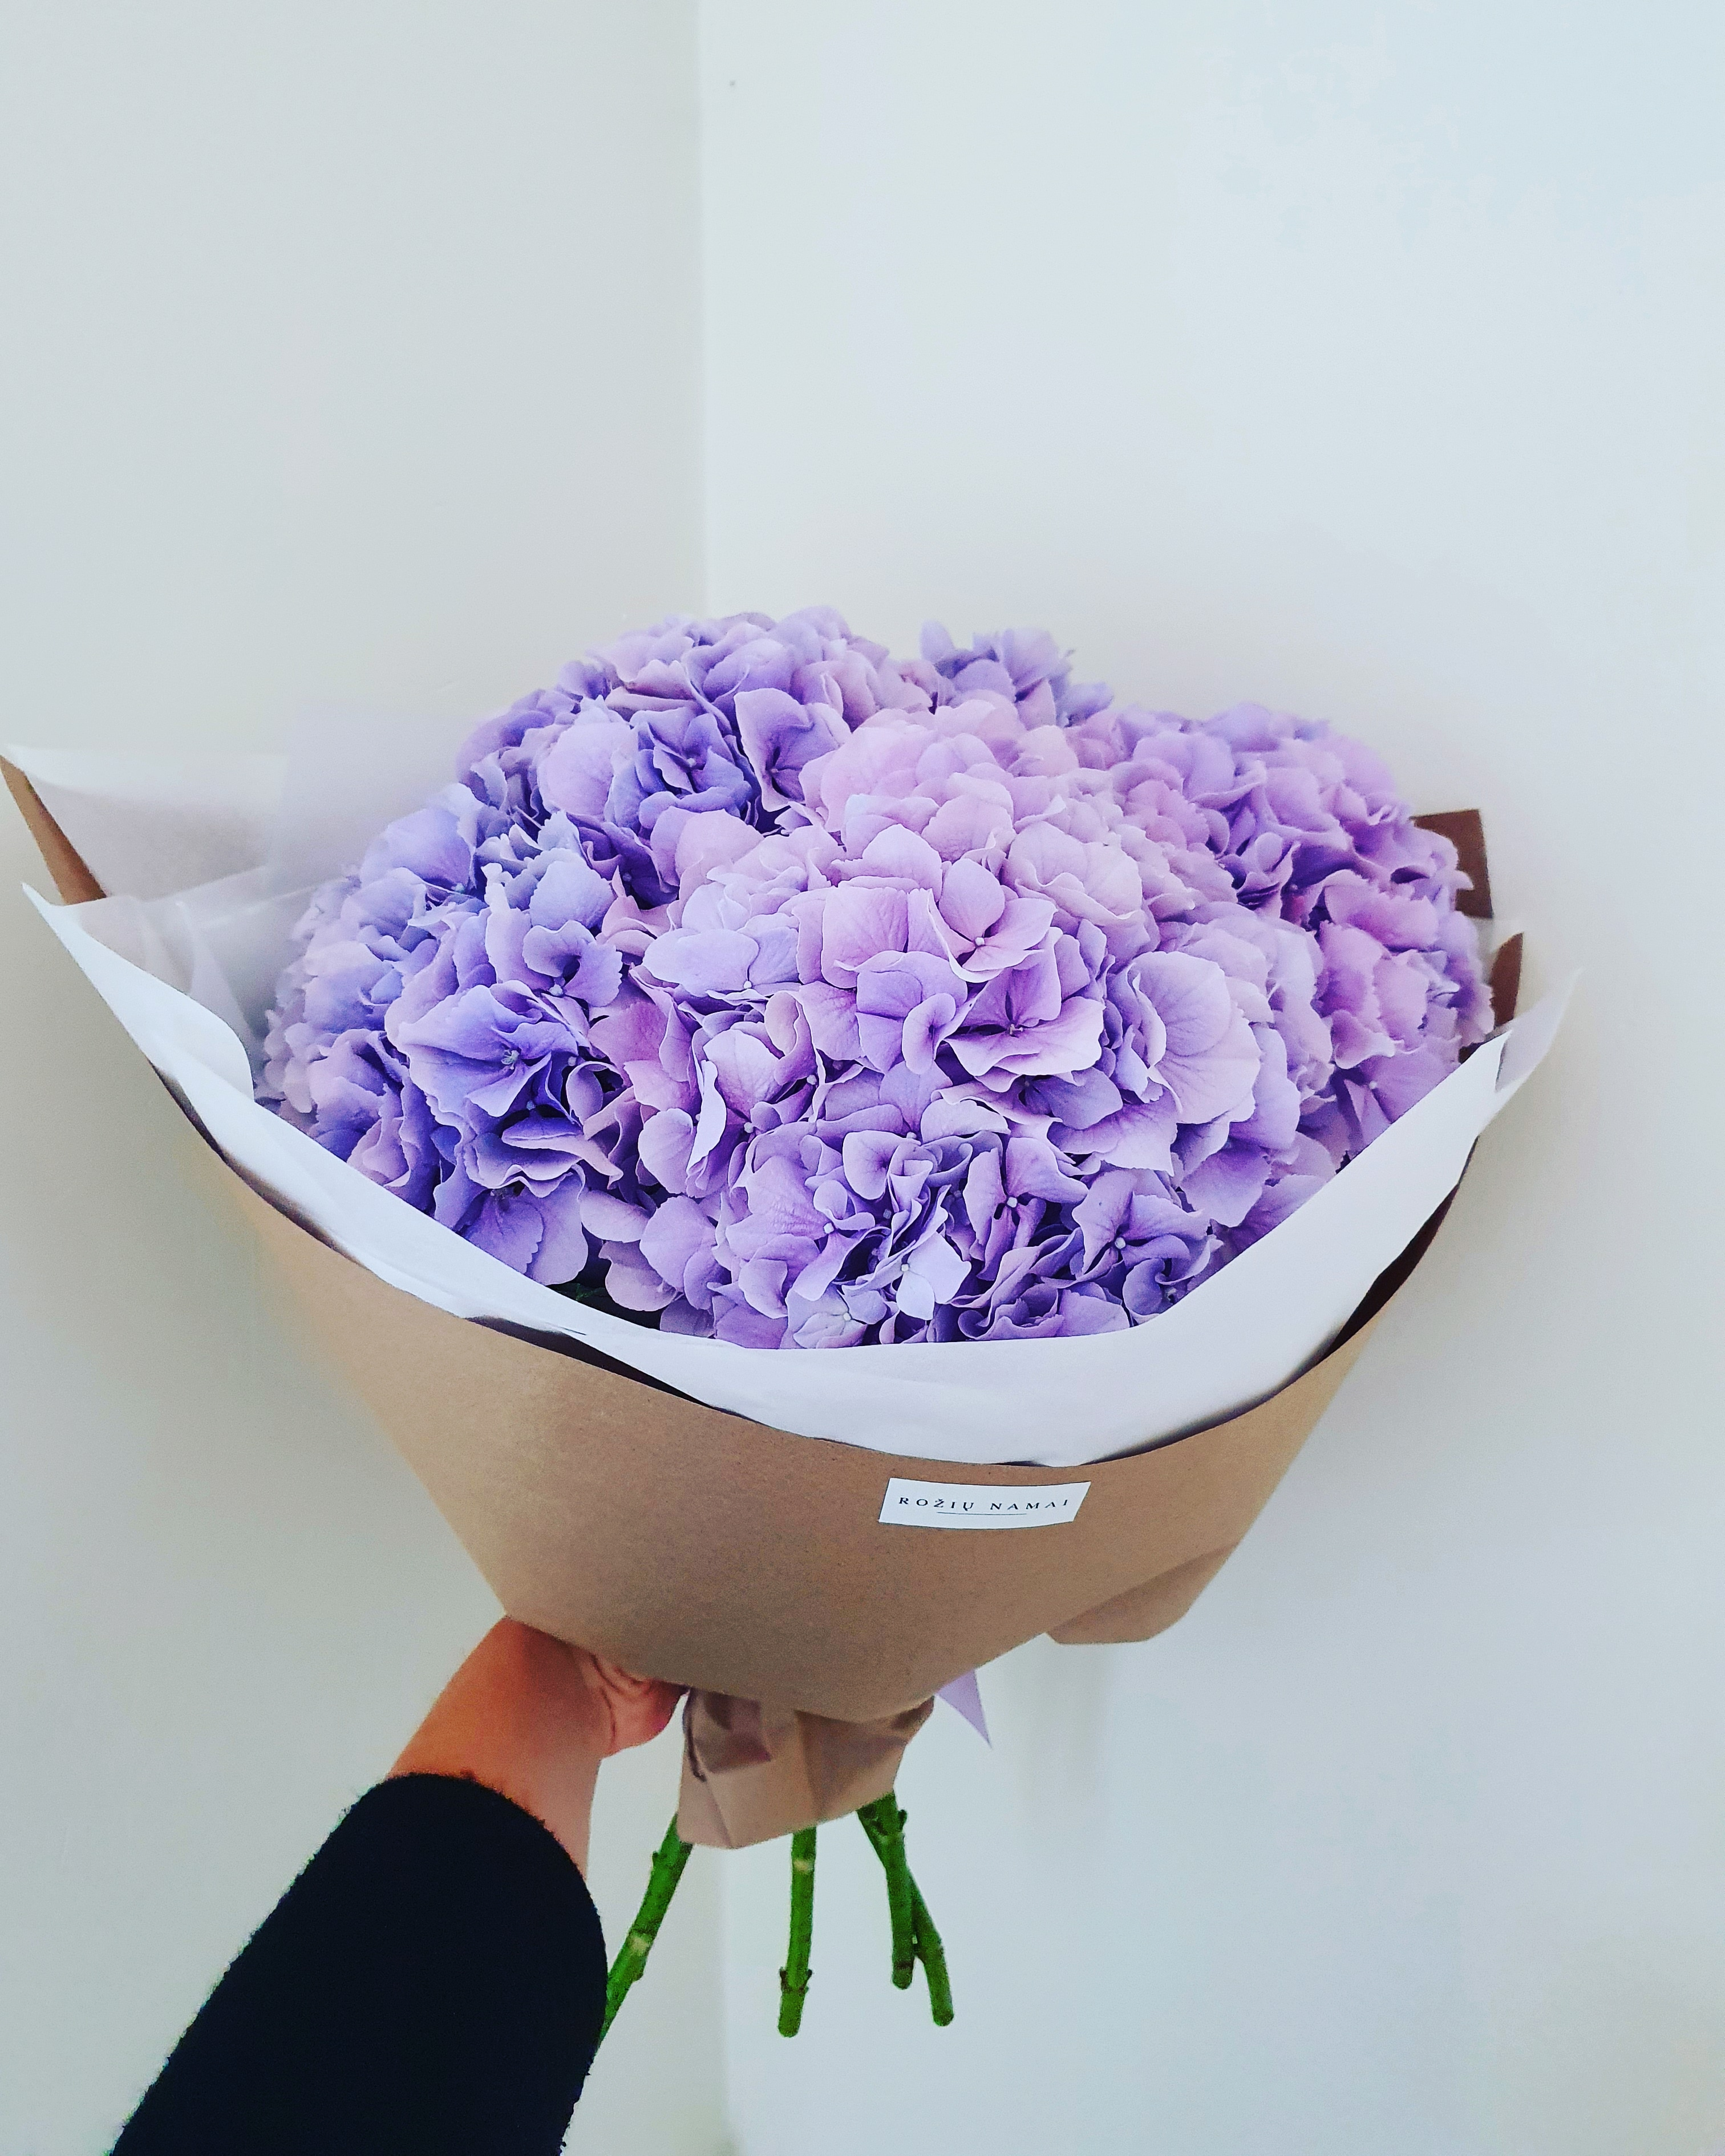 Hortenzijos / Lilac